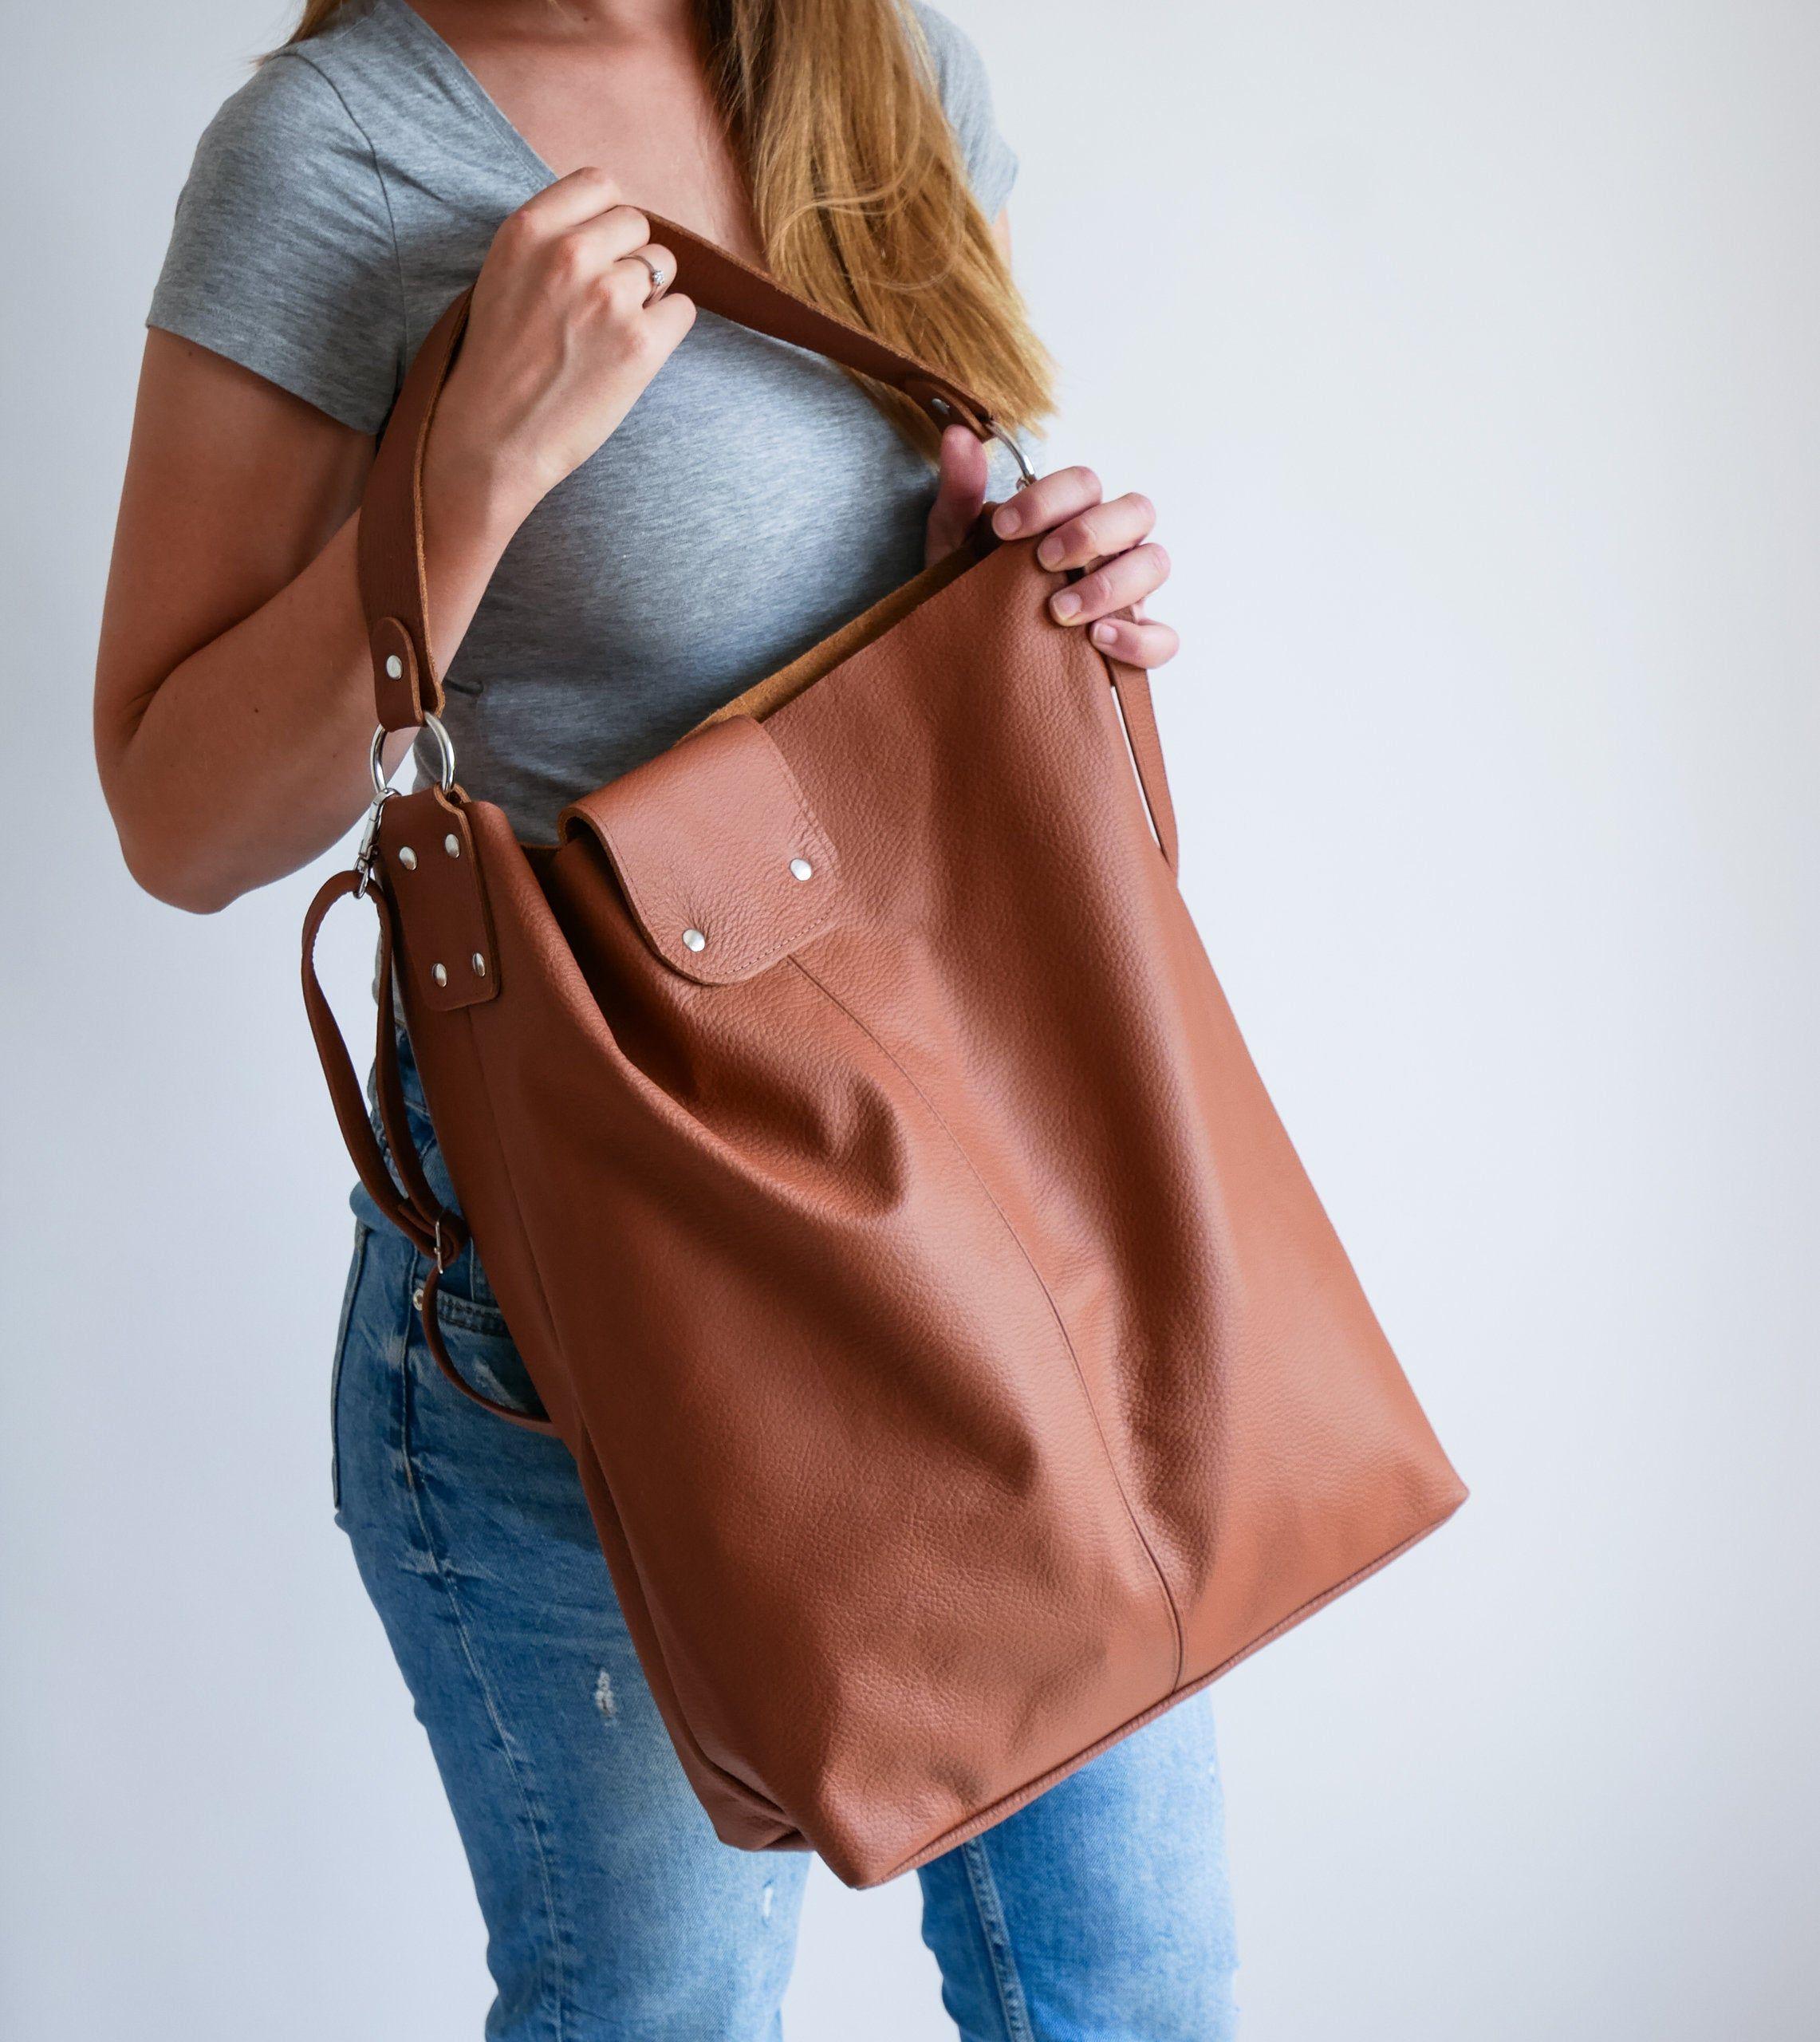 Oversize Brown Shopper Bag Large Leather Shopper Light Etsy Bolso Mochila De Cuero Mochilas De Cuero Bolso Mochila